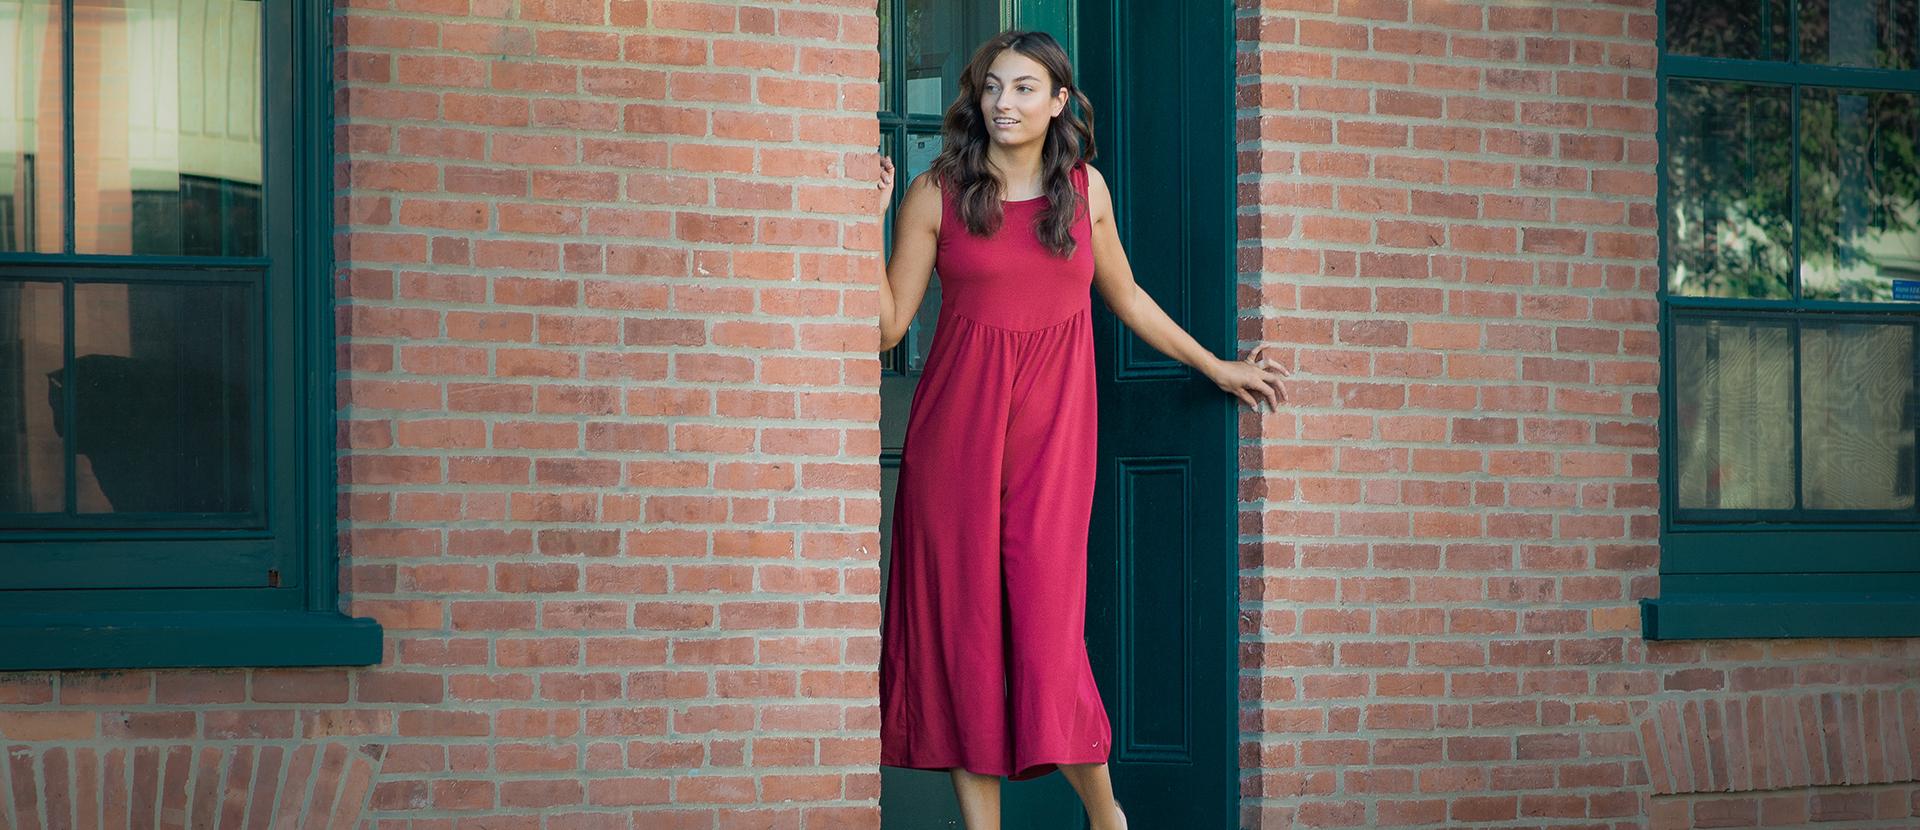 Robe Margaret | Designer de vêtement pour femme | Monarcky